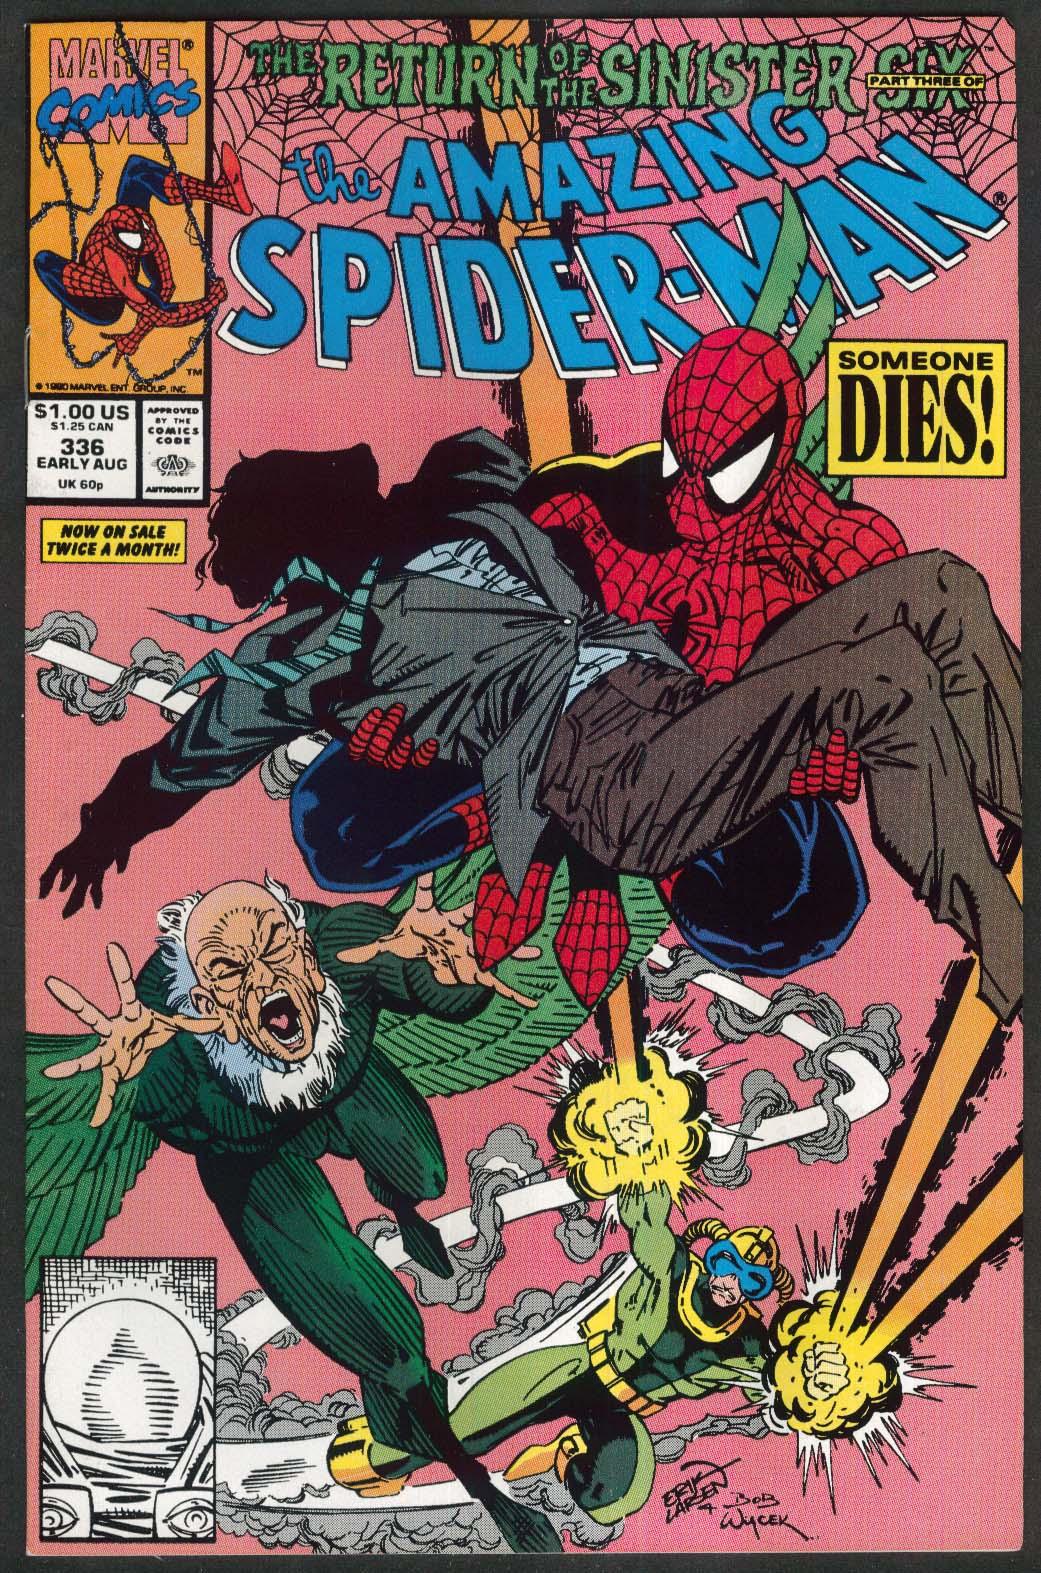 AMAZING SPIDER-MAN #336 Marvel comic book 8 1990